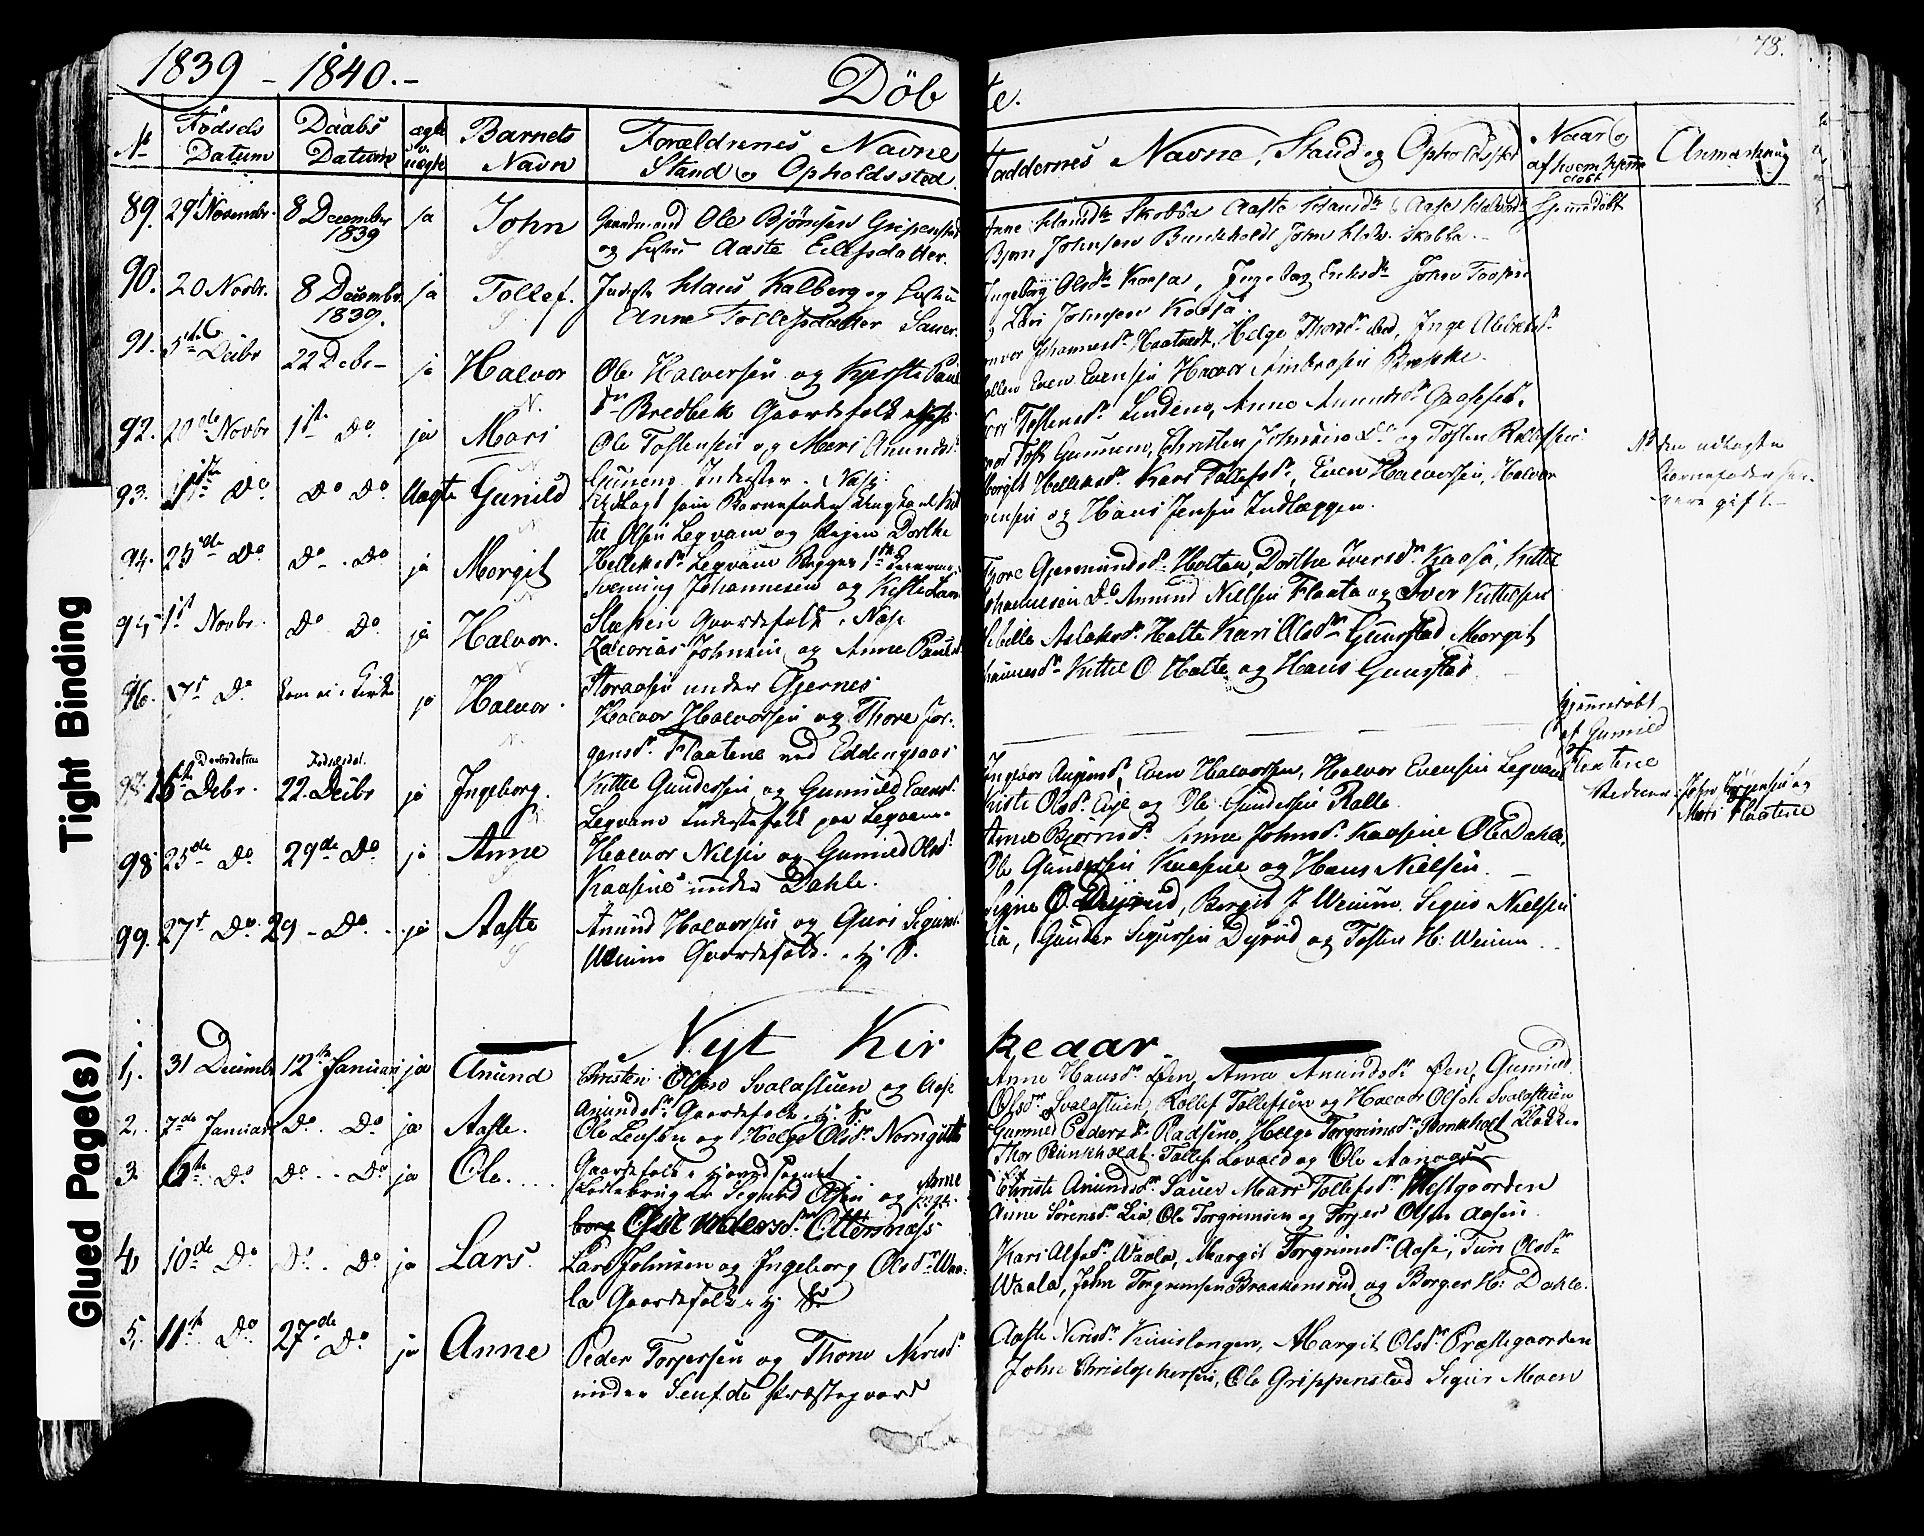 SAKO, Sauherad kirkebøker, F/Fa/L0006: Ministerialbok nr. I 6, 1827-1850, s. 78